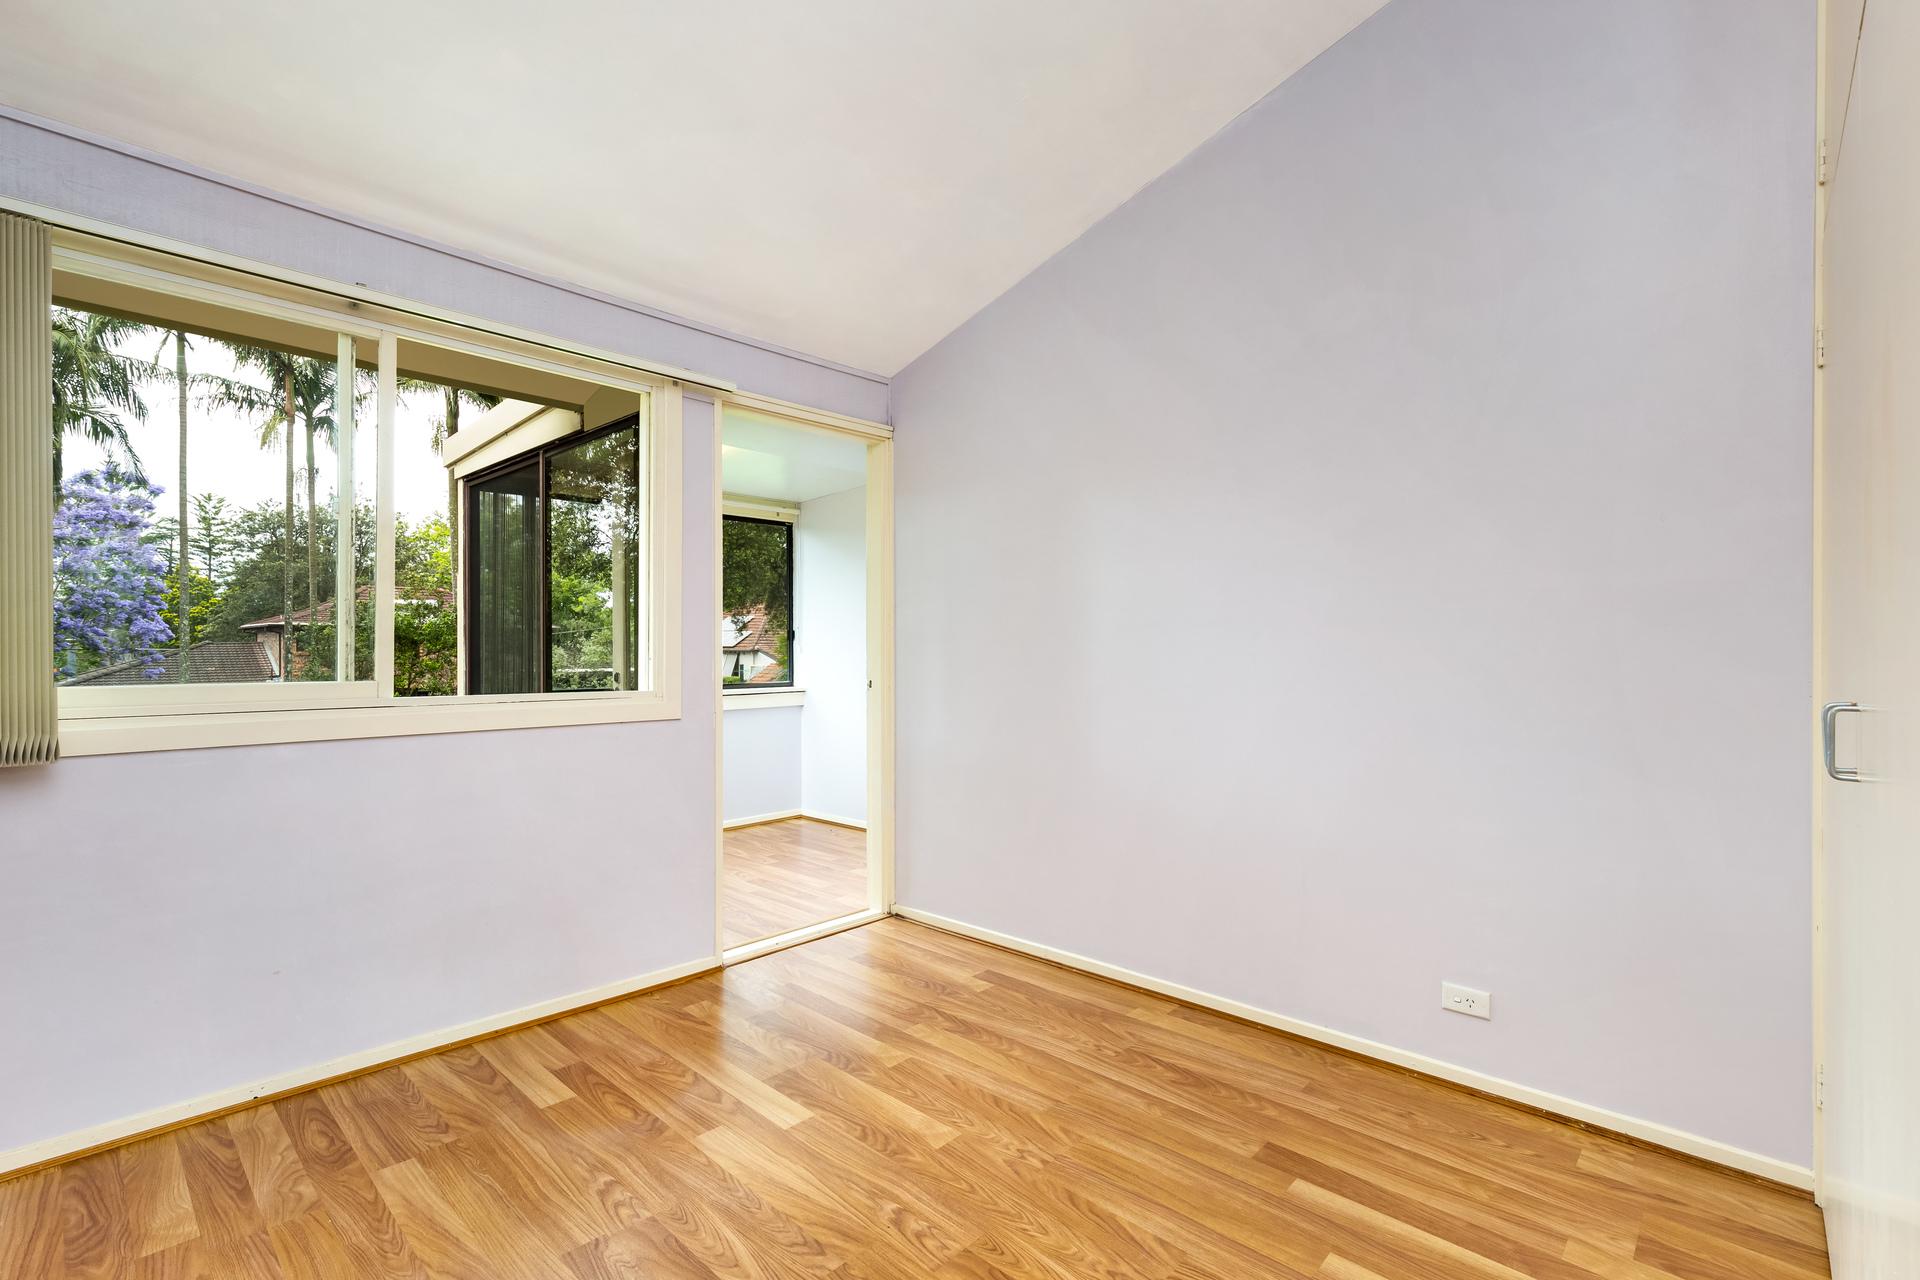 4B Burns Road, Wahroonga NSW 2076 - Property Information